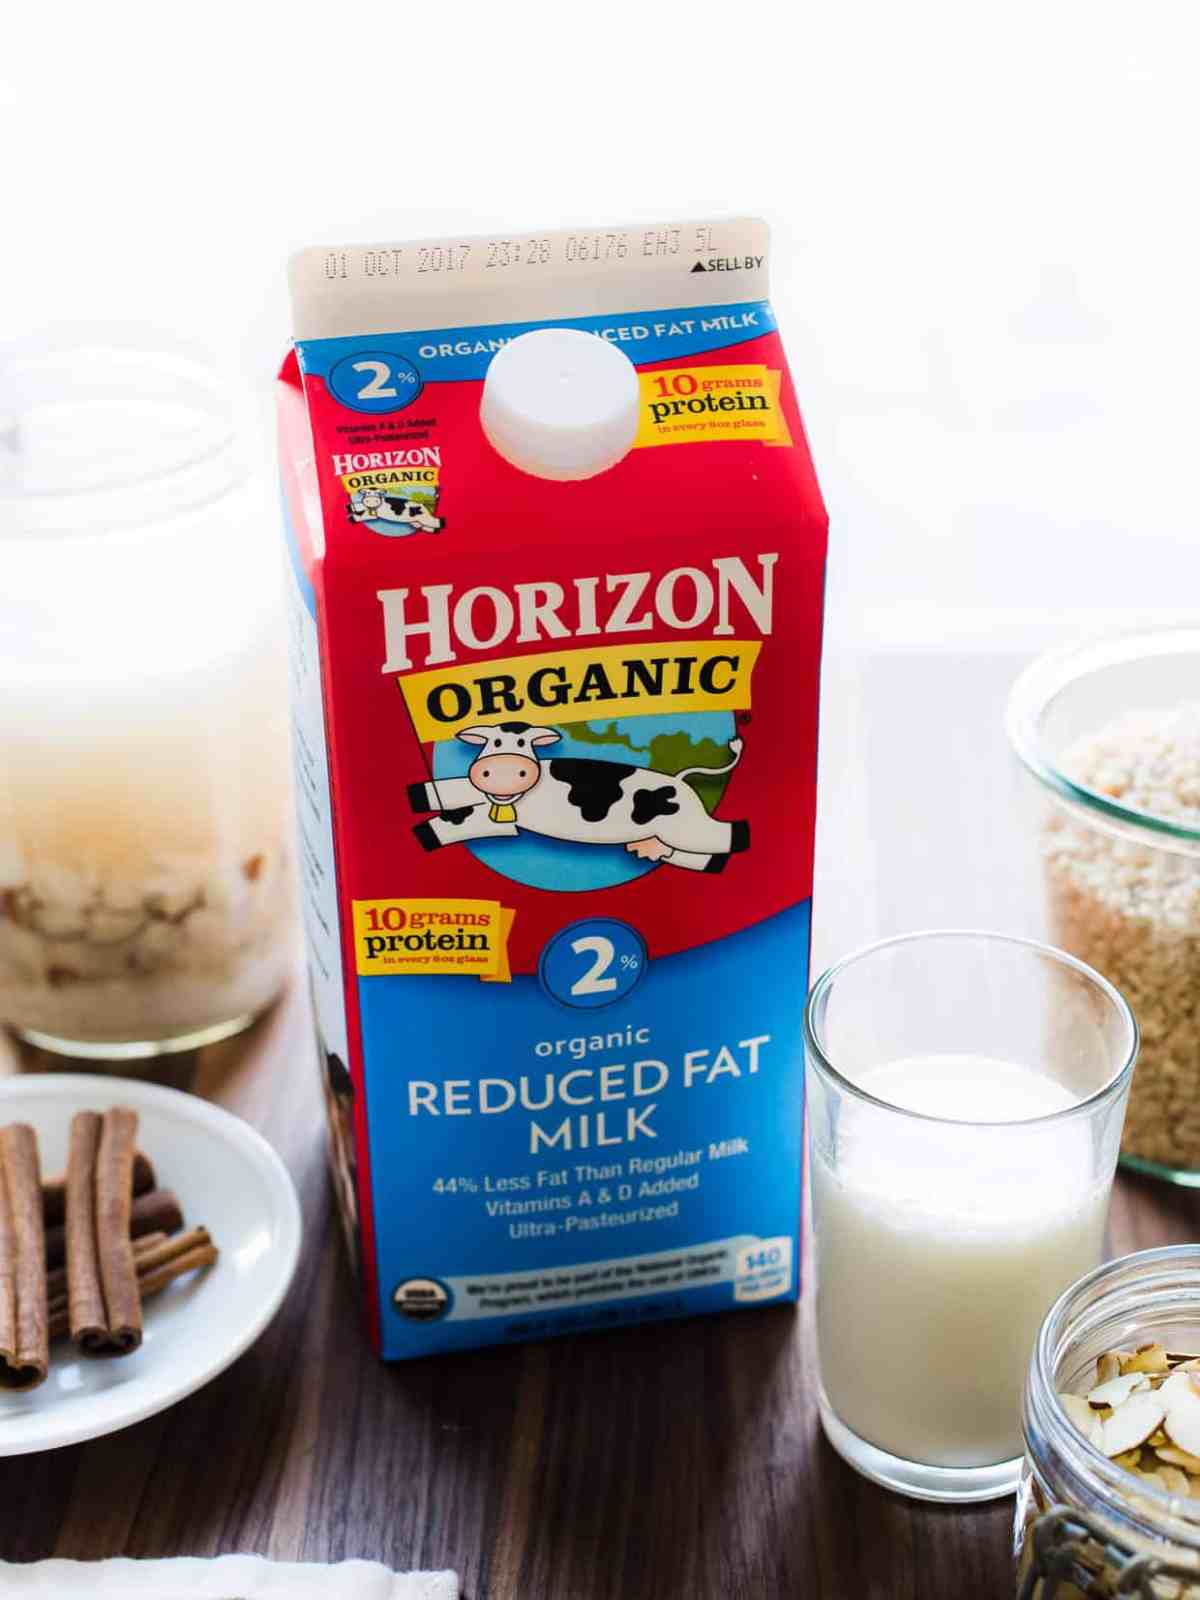 Horizon Organic milk makes homemade horchata extra creamy.